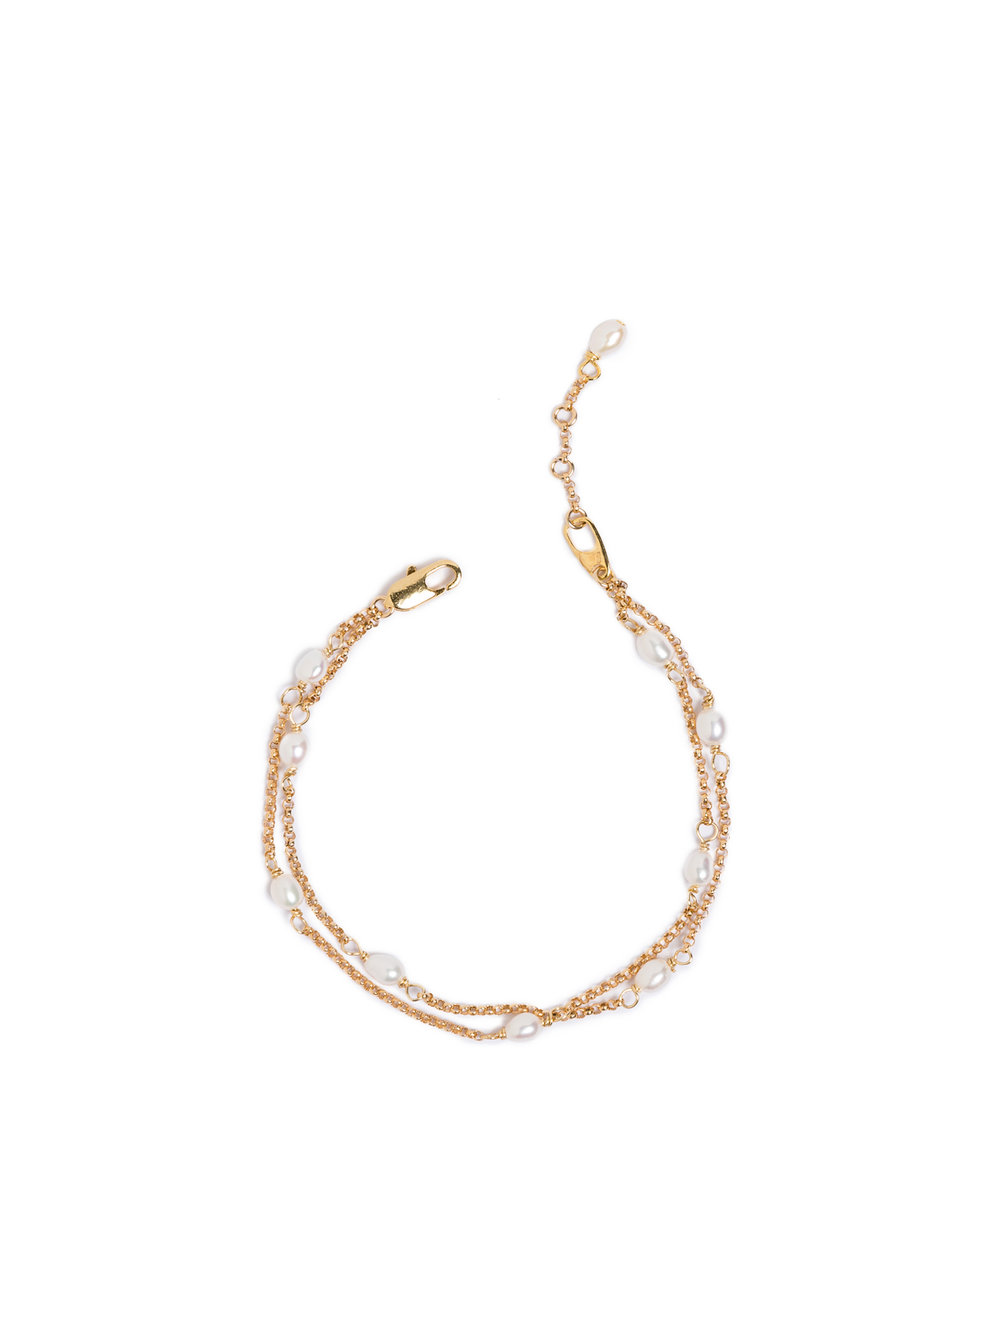 EVANDER freshwater pearl bracelet 1_Tania Maras.jpg